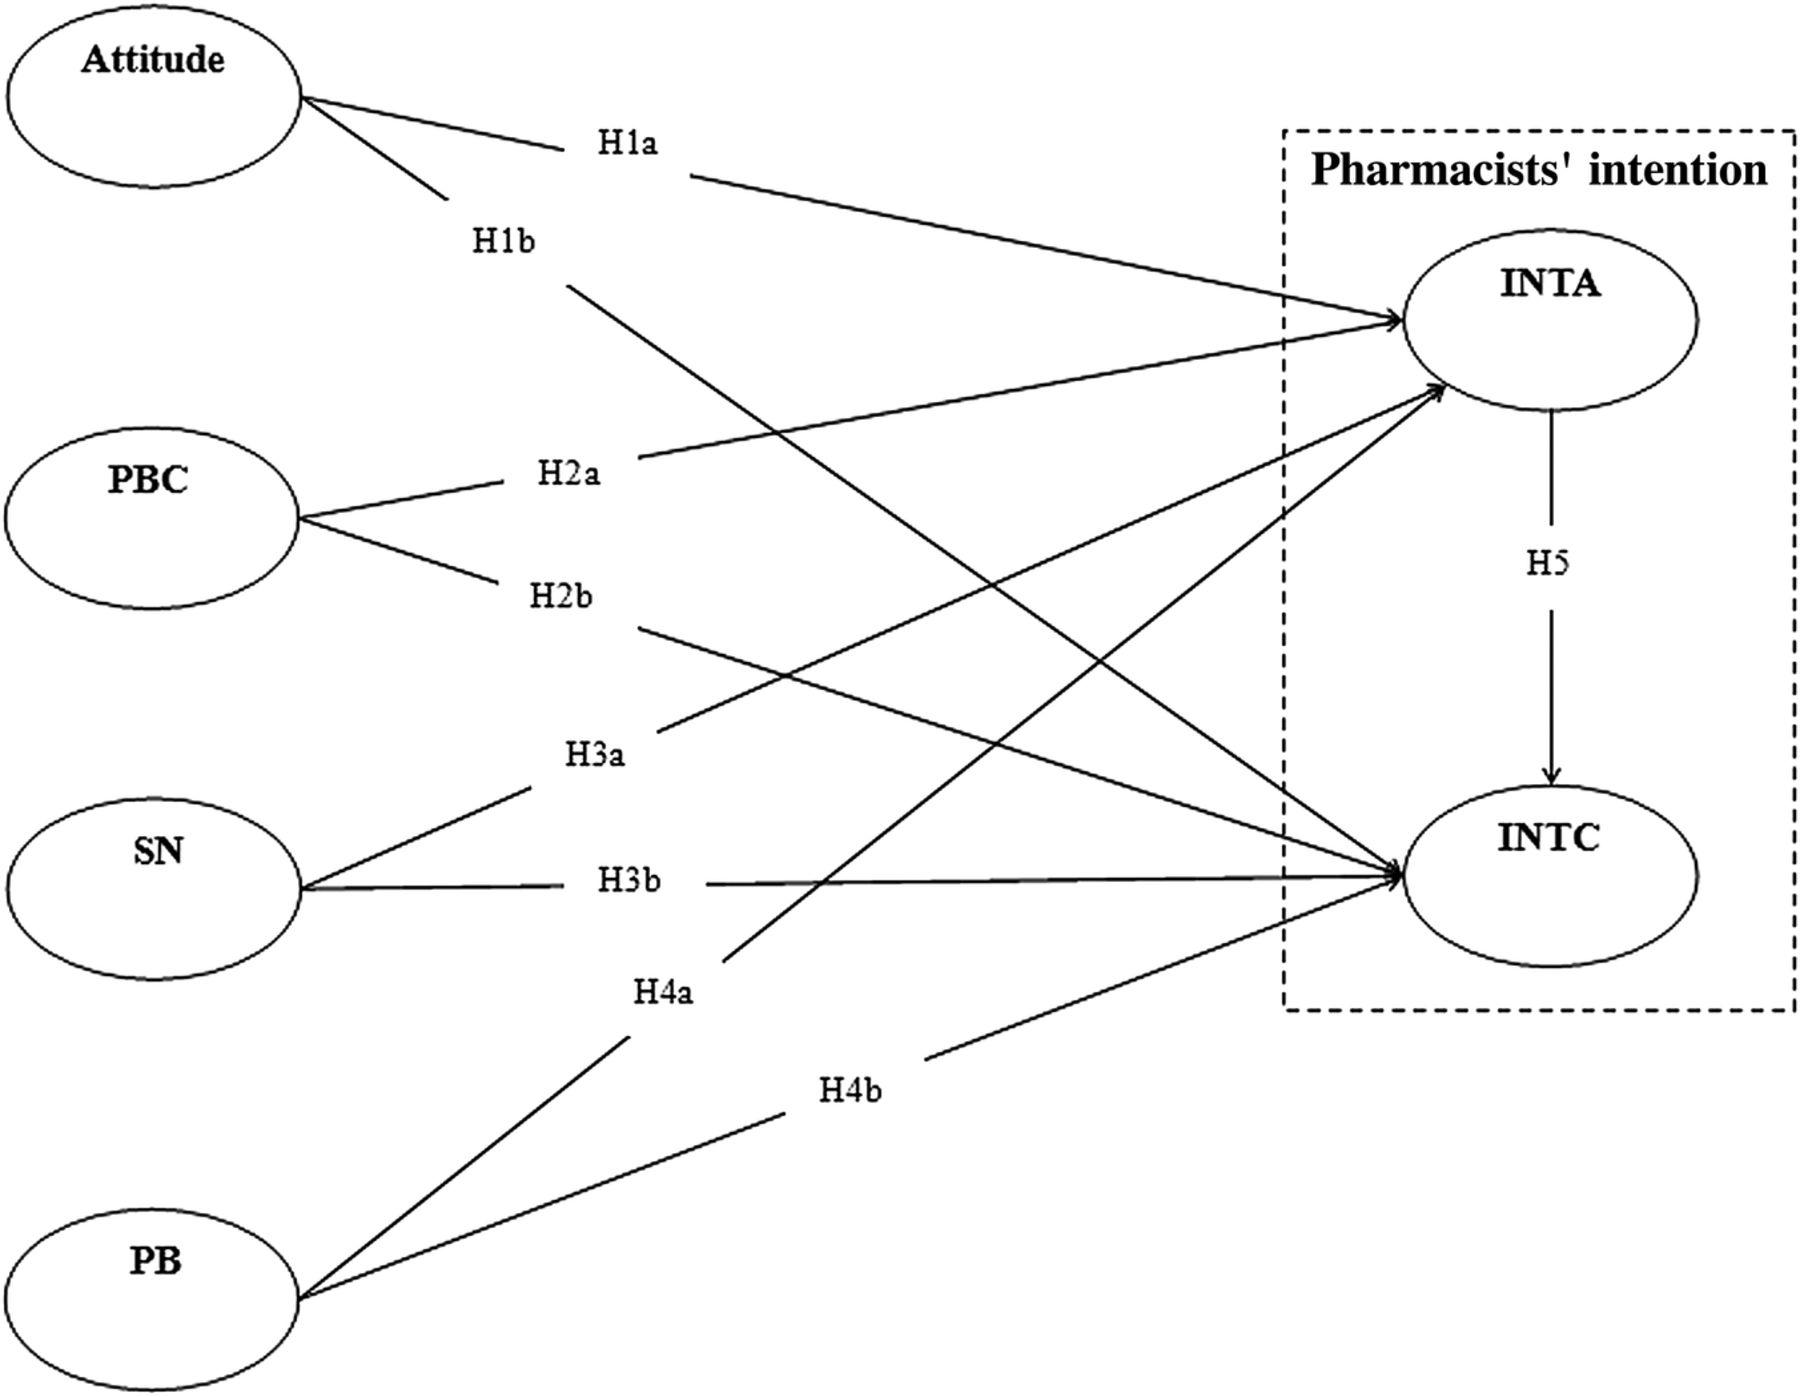 Examination of psychosocial predictors of Chinese hospital